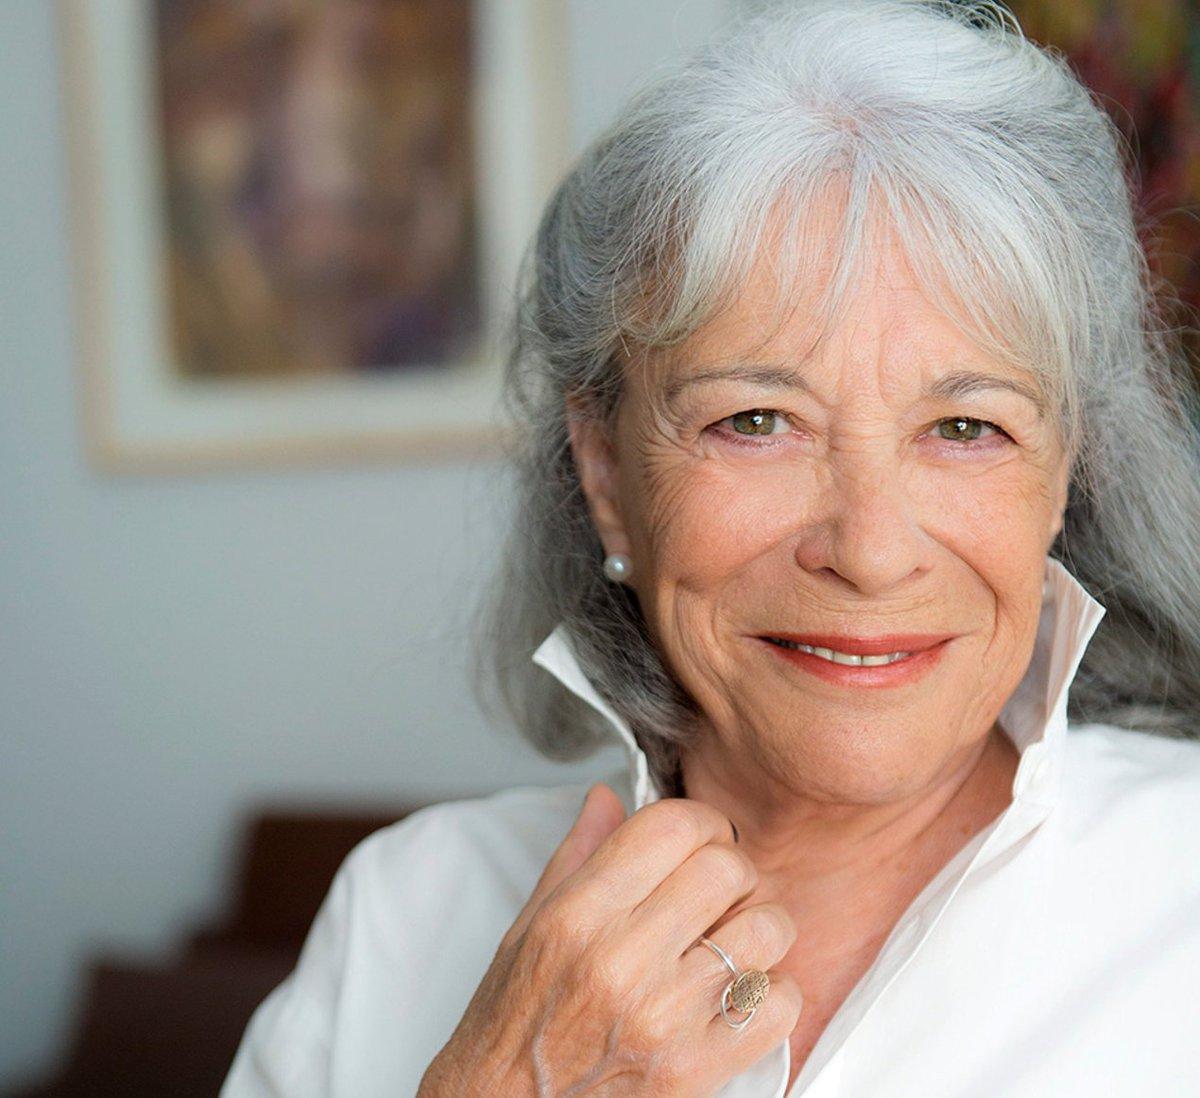 Carole Lesley,Parvaneh Soltani Adult videos Betty Brosmer,Cintia Dicker